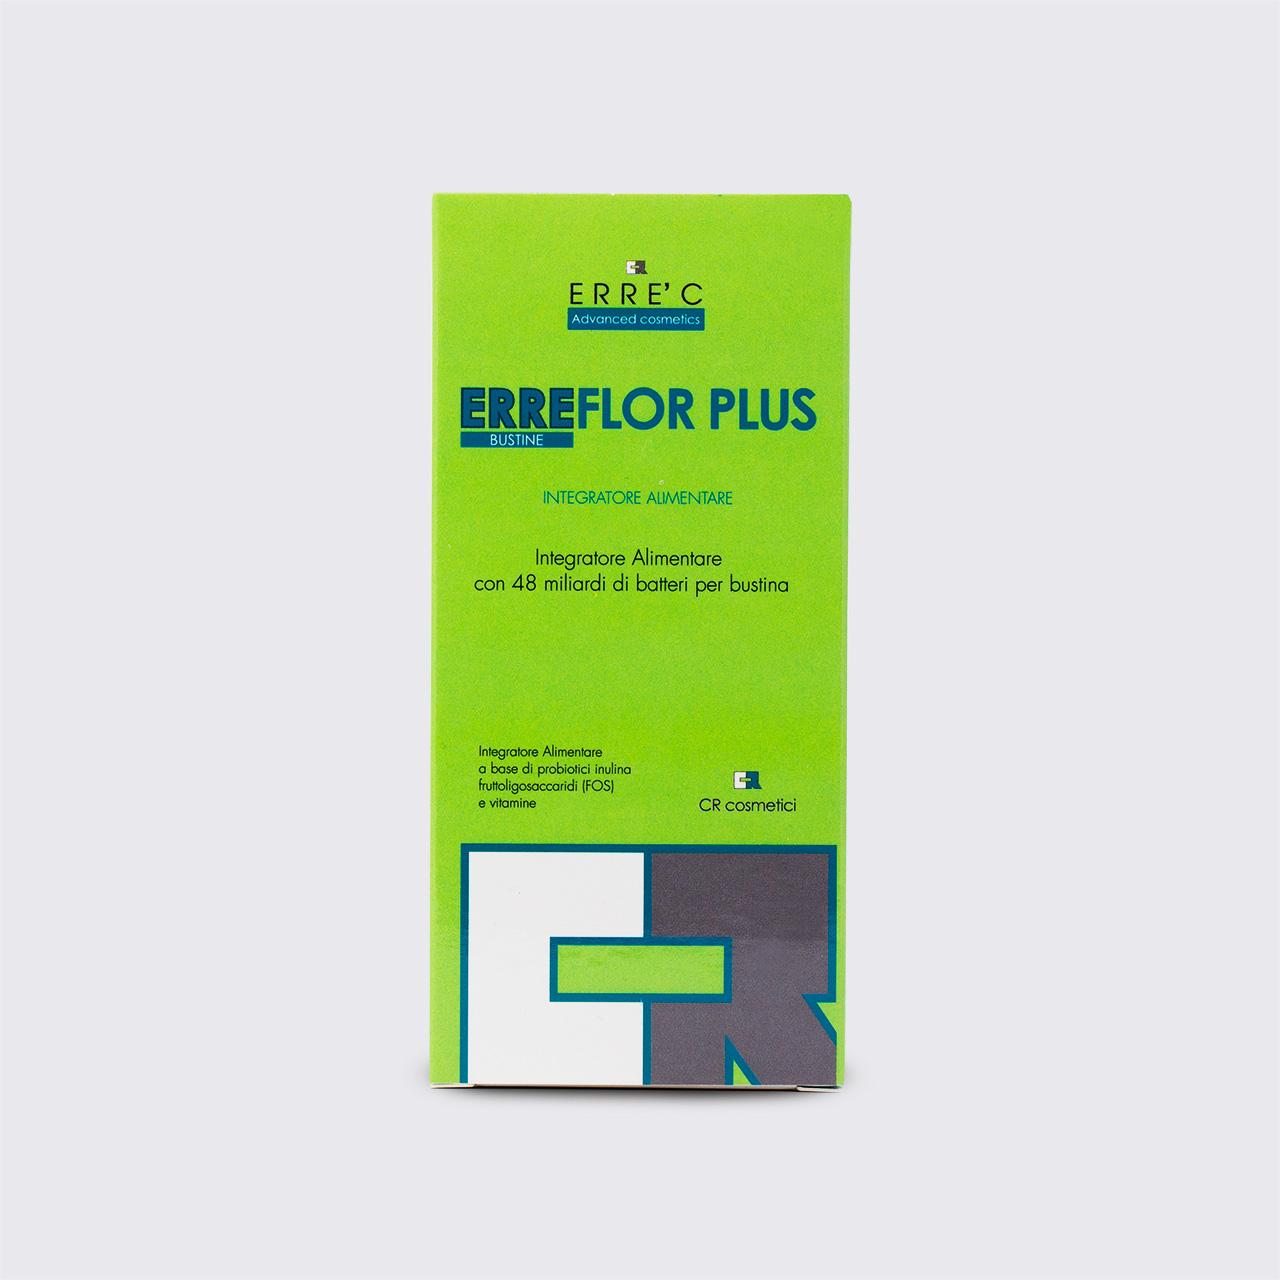 Acido Citrico Dosi Alimentari erreflor plus - integratore alimentare per equilibrio flora batterica  intestinale